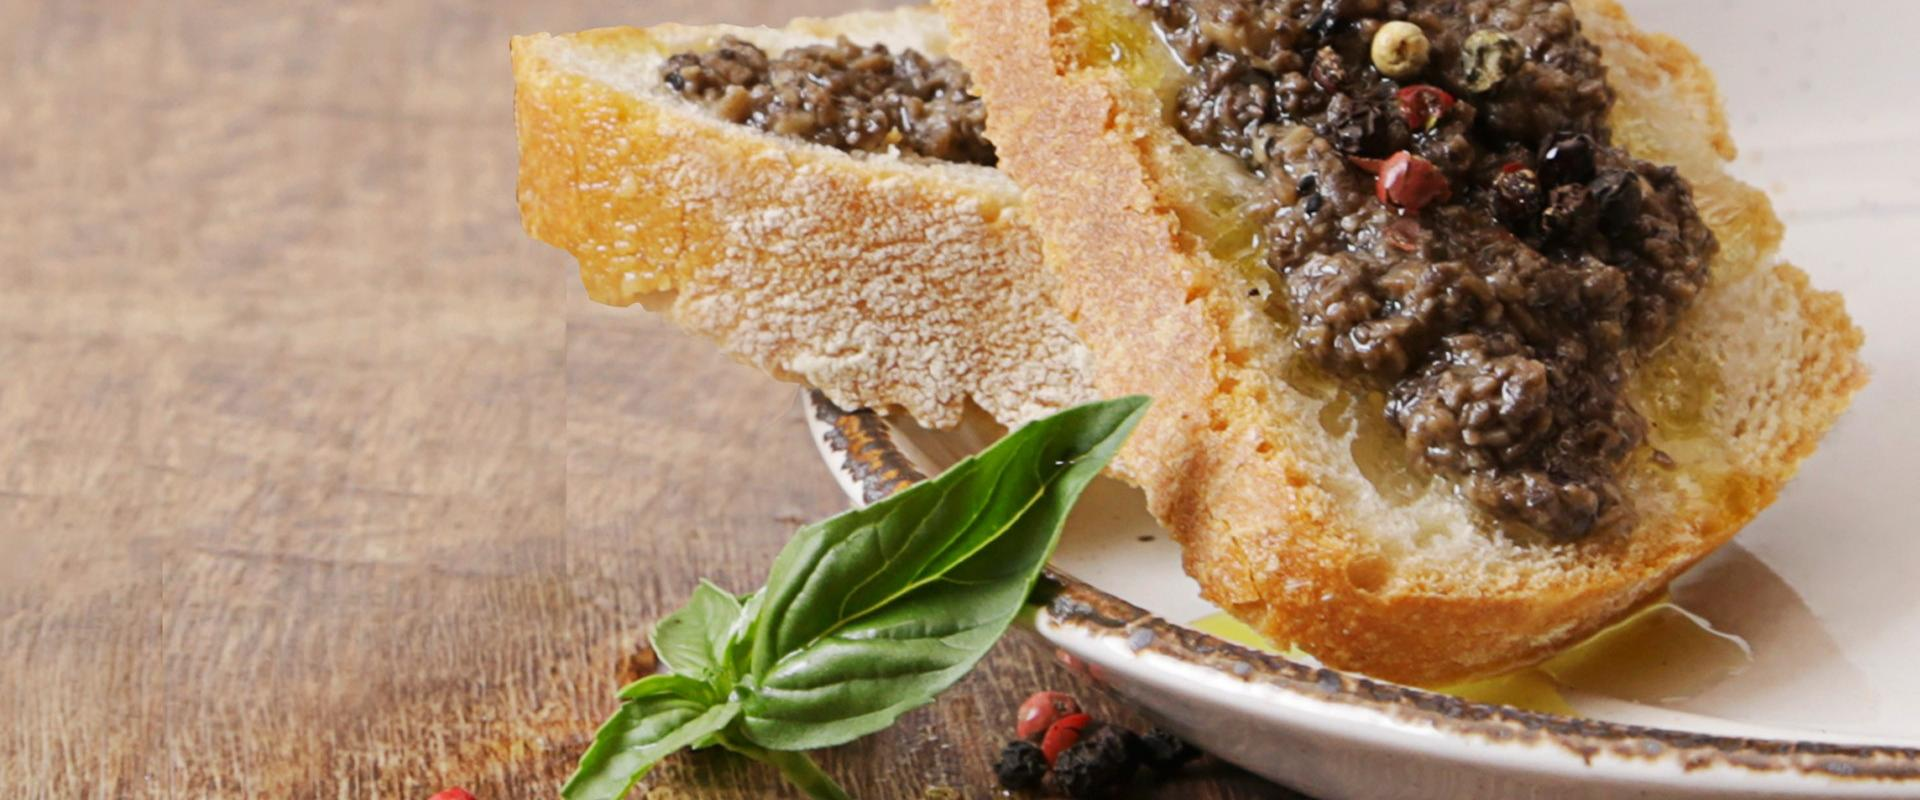 Food experience at local restaurant in Magliano di Tenna